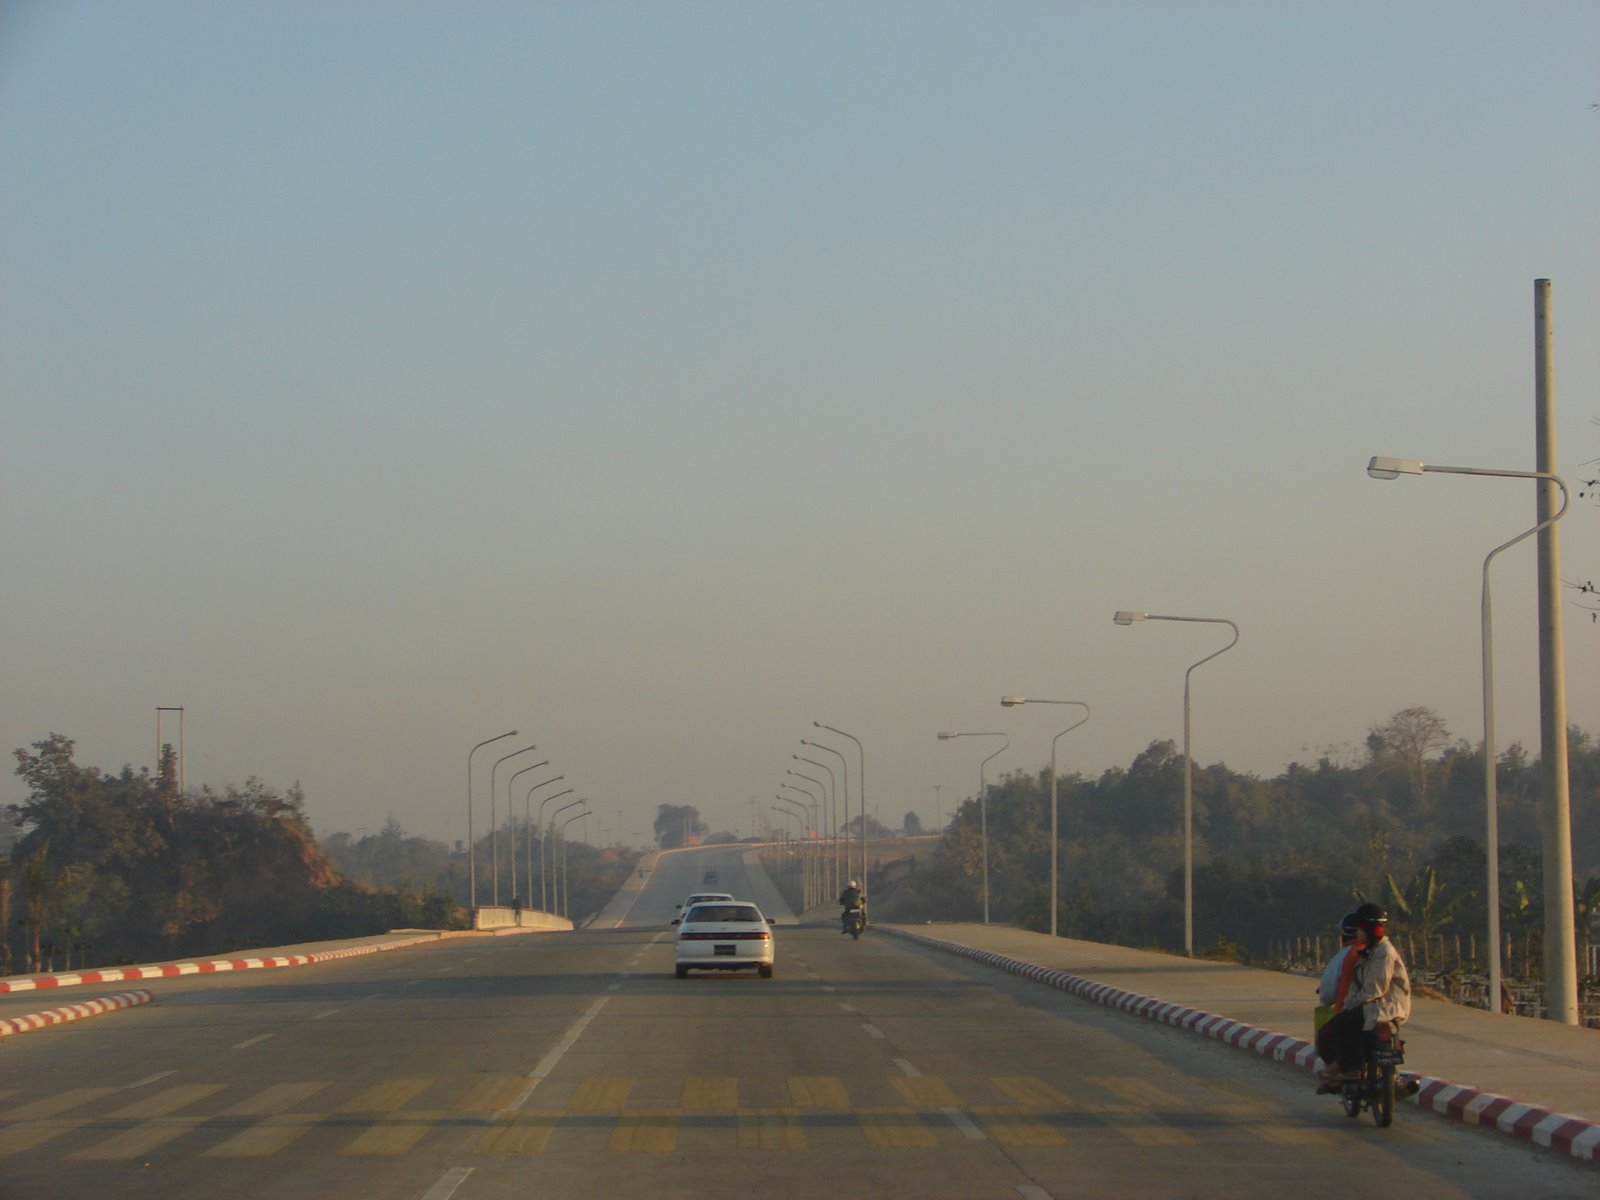 [Myanmar-Napyitaw-Jan+2006+009+--++The+capital]